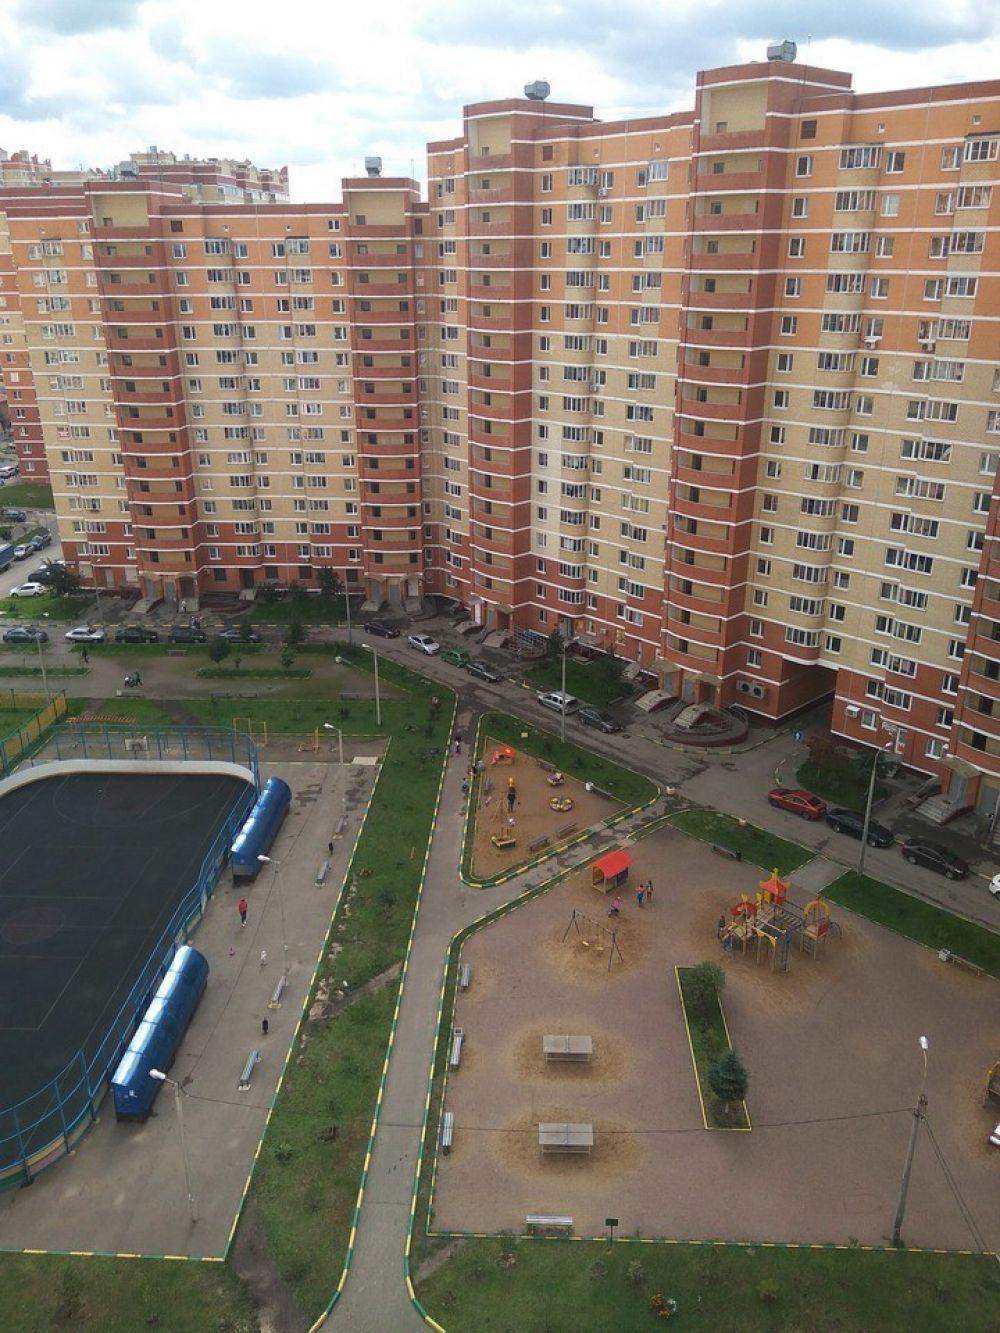 1-комнатная квартира 47.6 м2, г. Щелково, Богородский мкр,10, фото 15